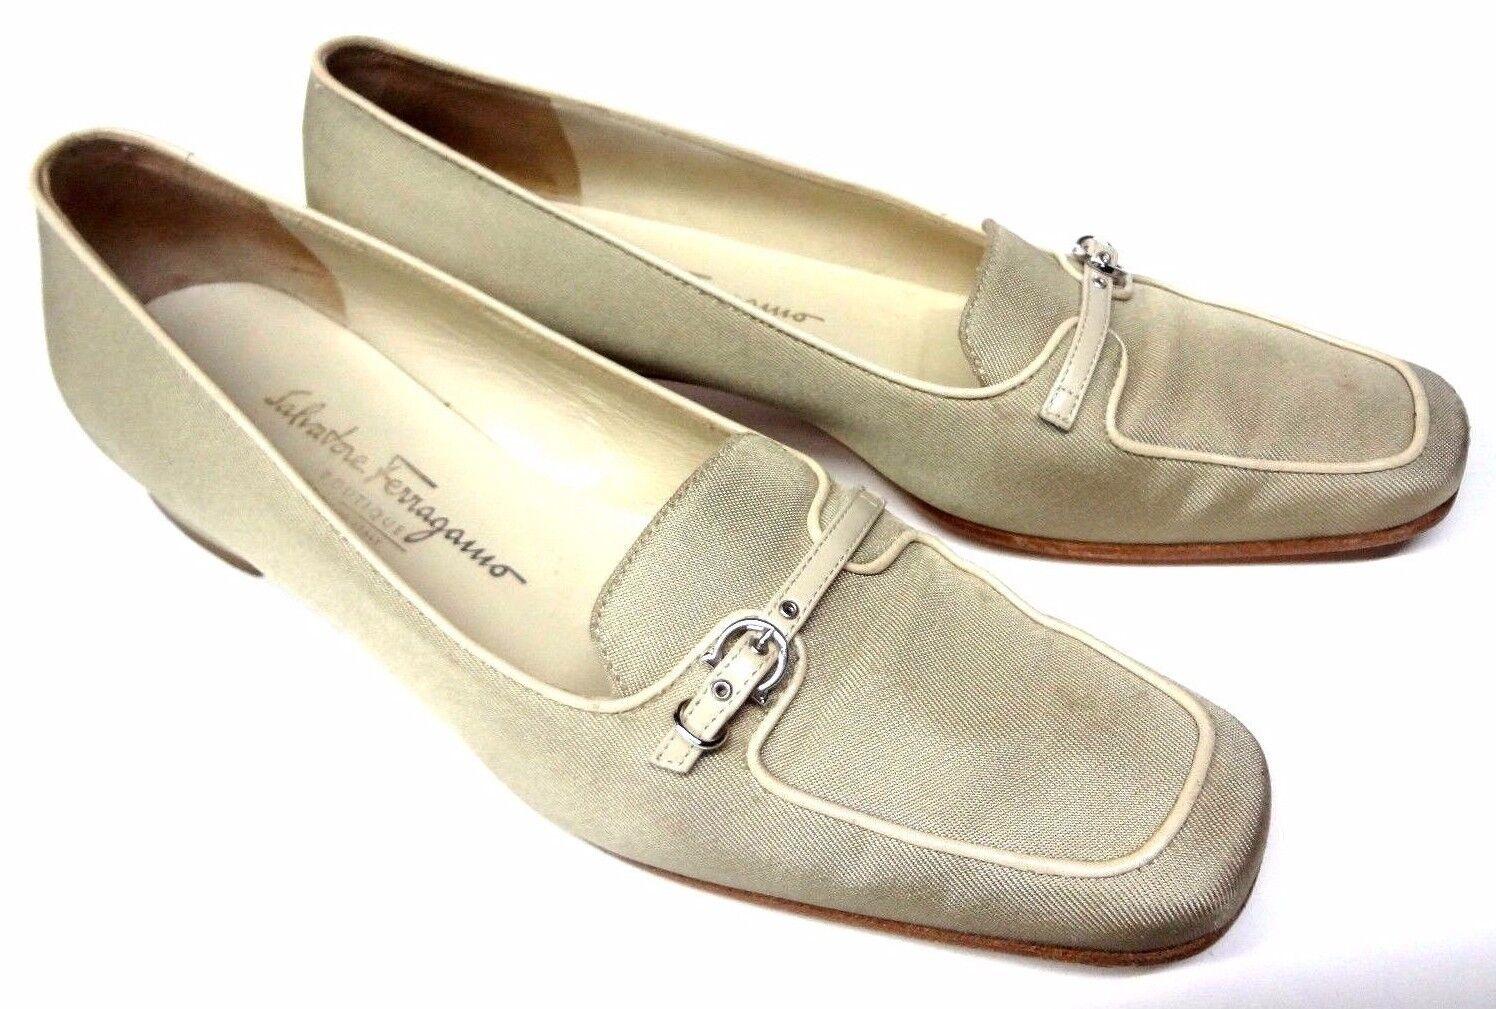 SALVATORE FERRAGAMO LOAFERS MOCCASIN Schuhe SIZE 7.5 2A